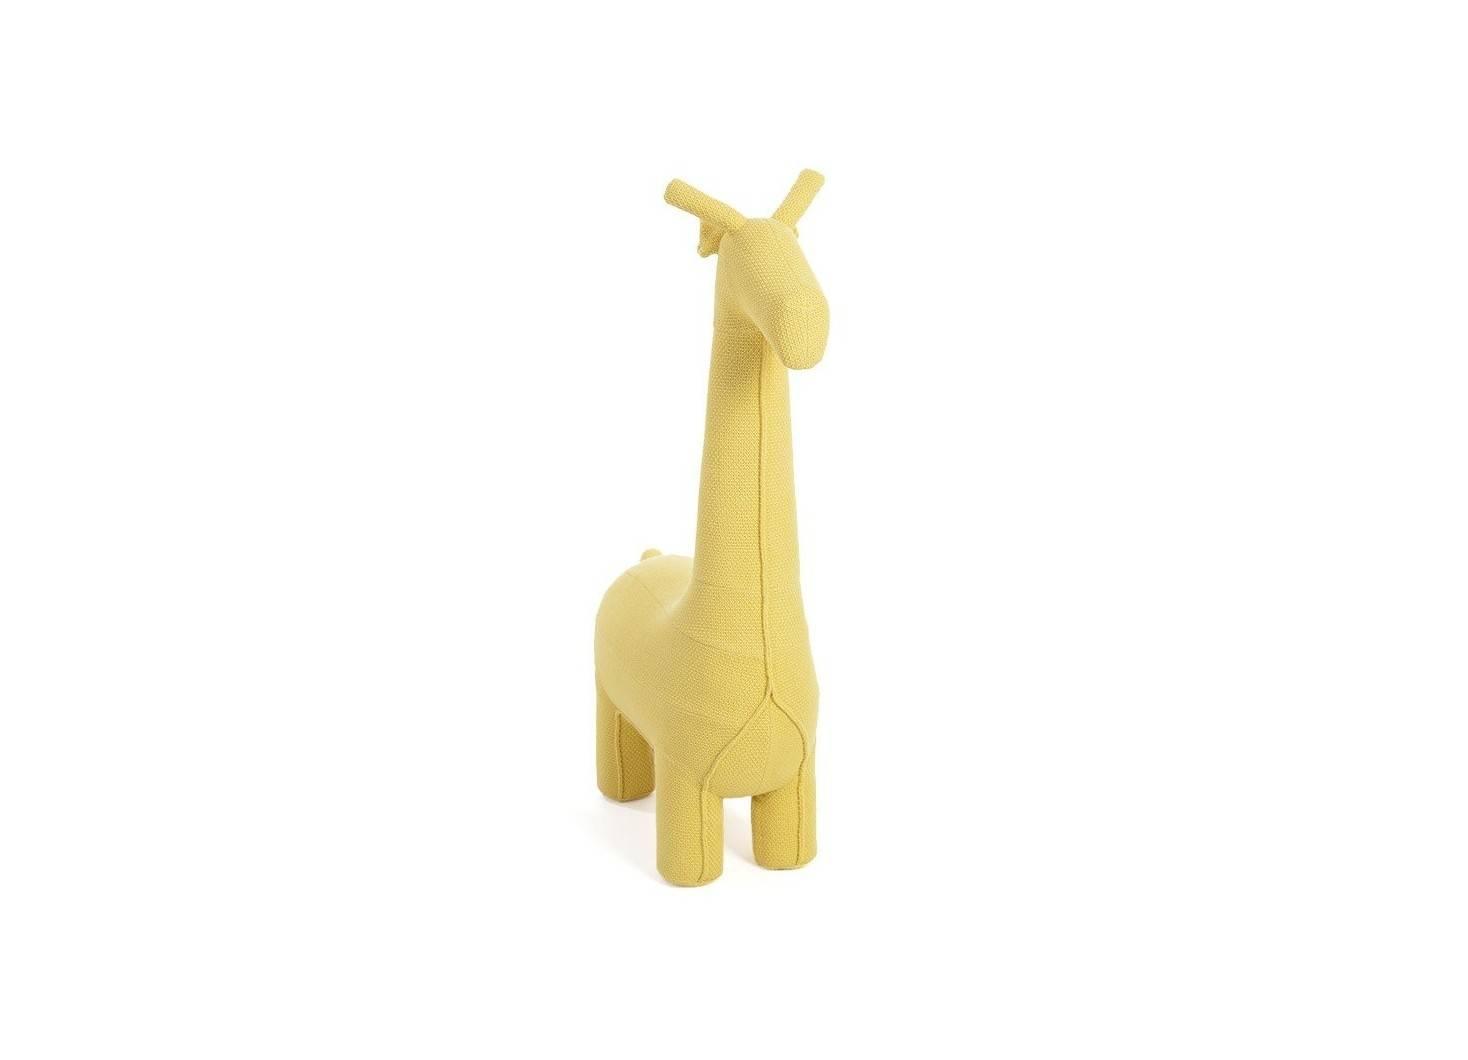 Pouf girafe jaune. Fil de coton tricoté. 128 cm